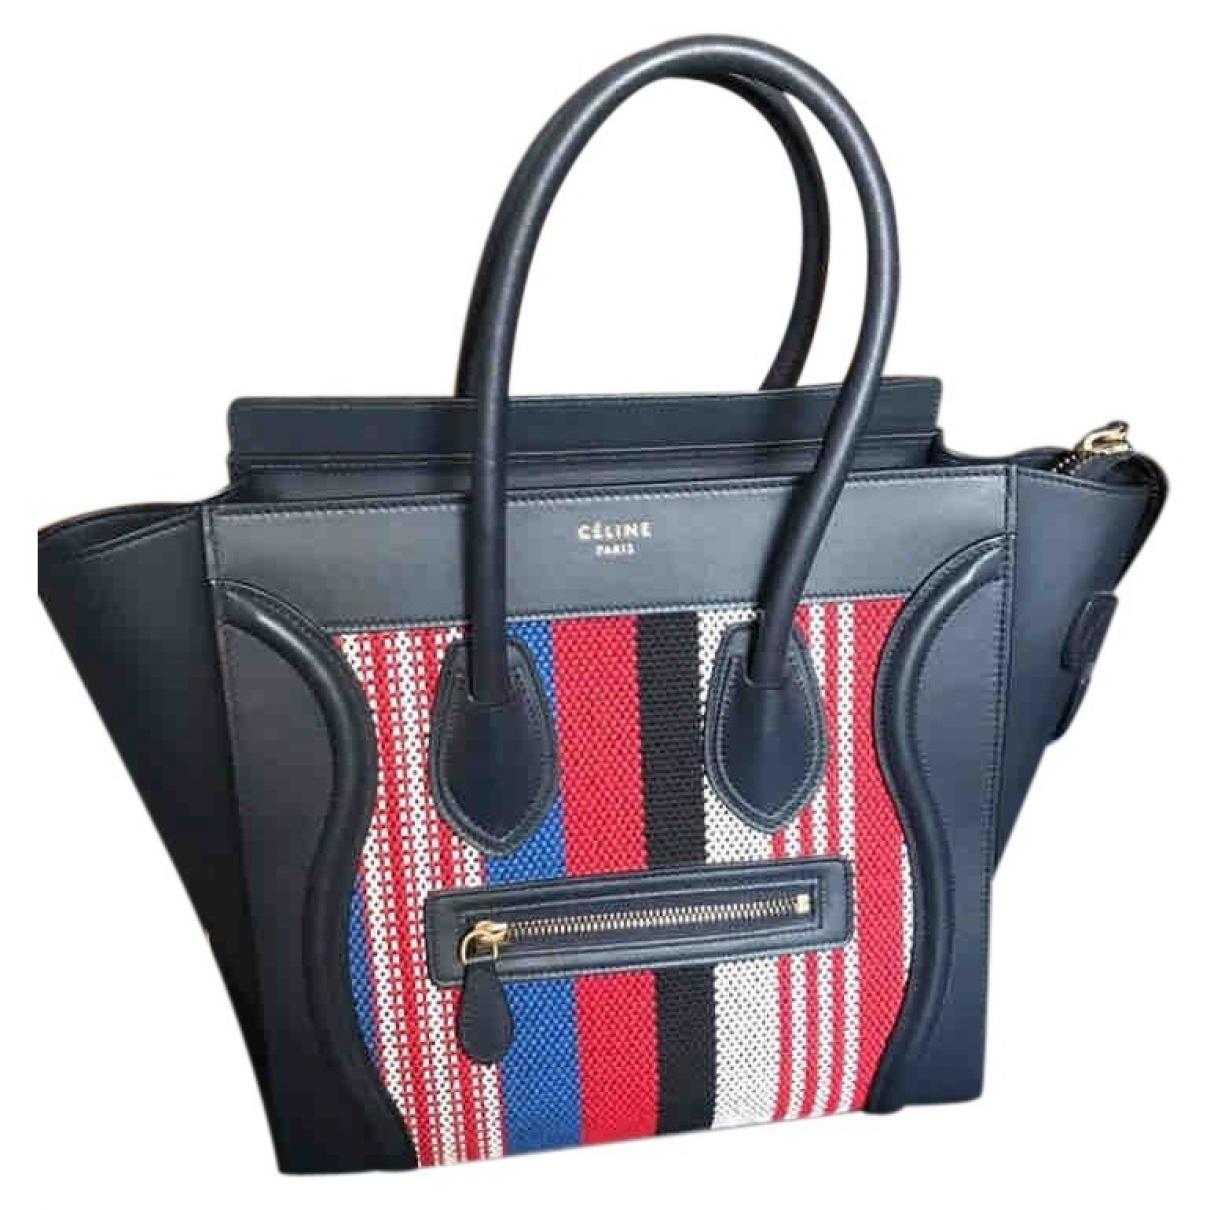 Celine - Sac a main Luggage pour femme en cuir - marine